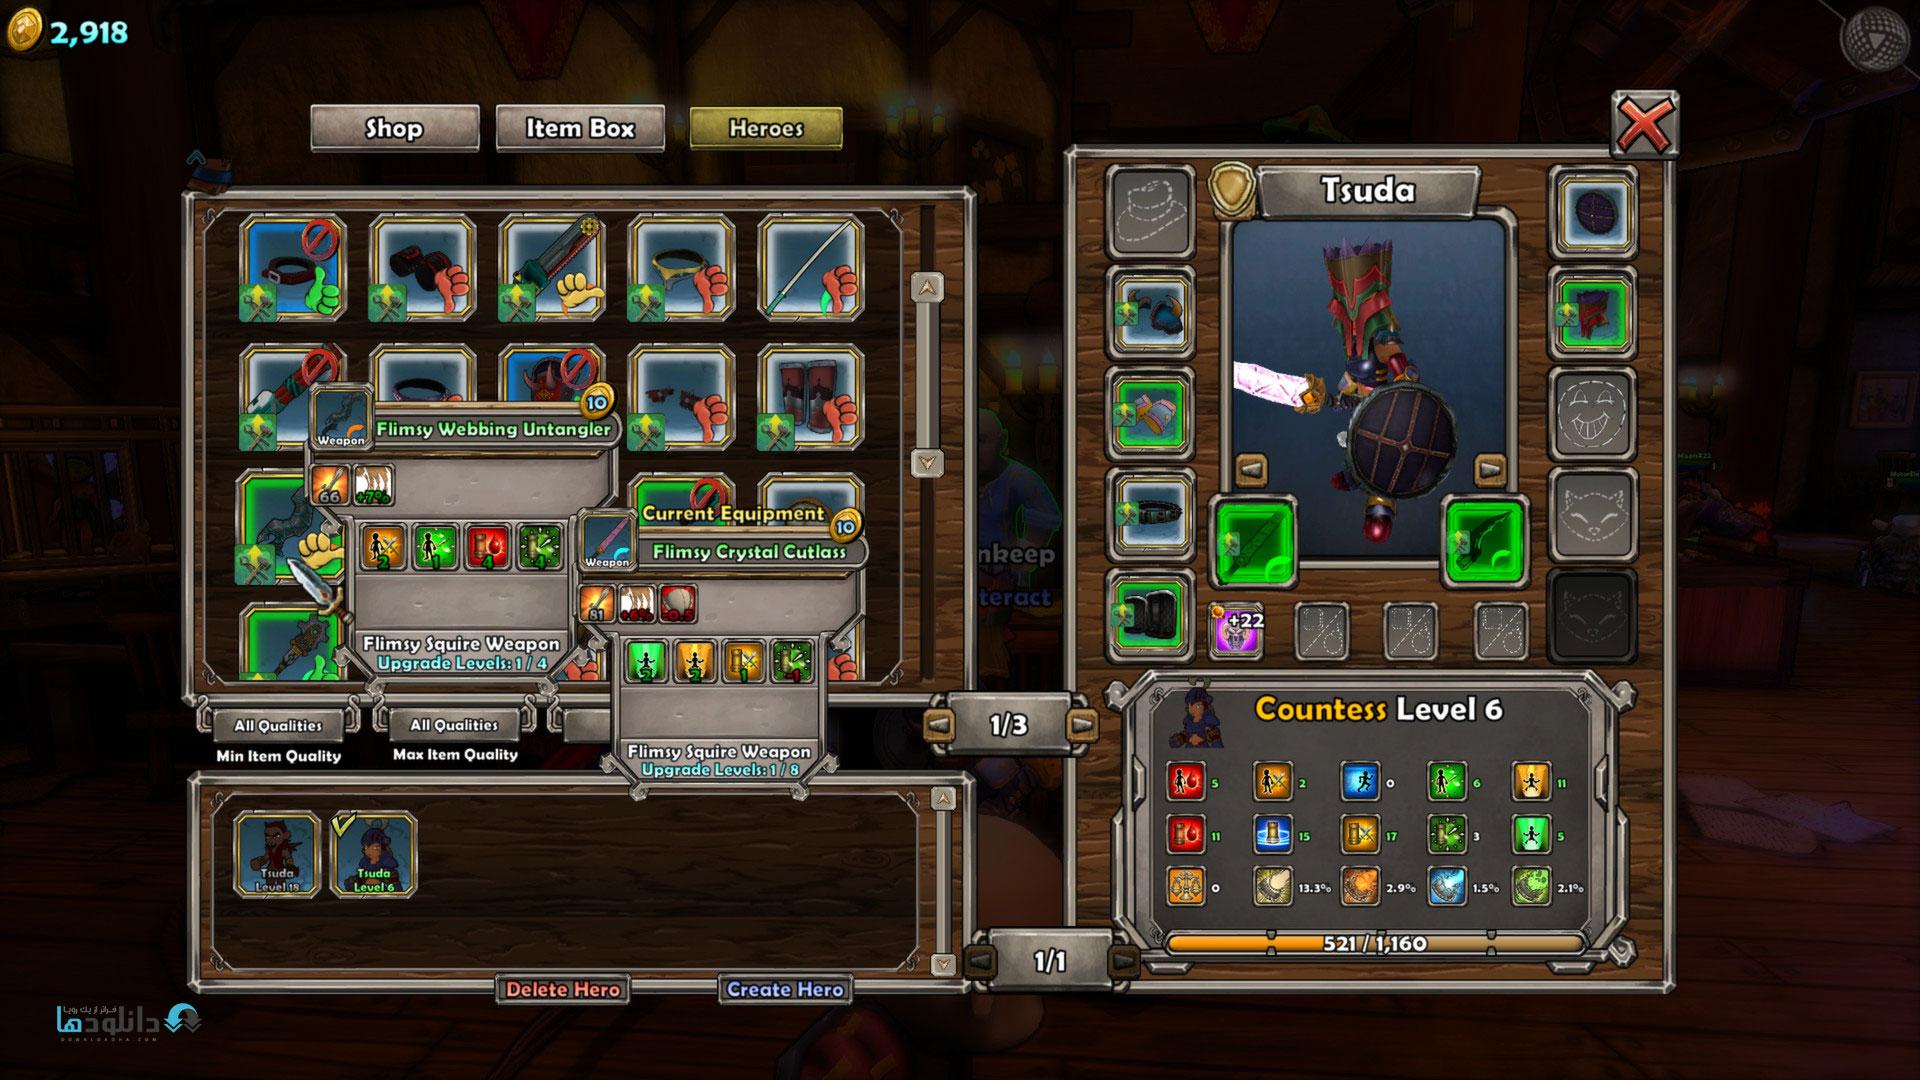 http://img5.downloadha.com/hosein/Game/April%202015/07/Dungeon-Defenders-Eternity-screenshots-01-large.jpg